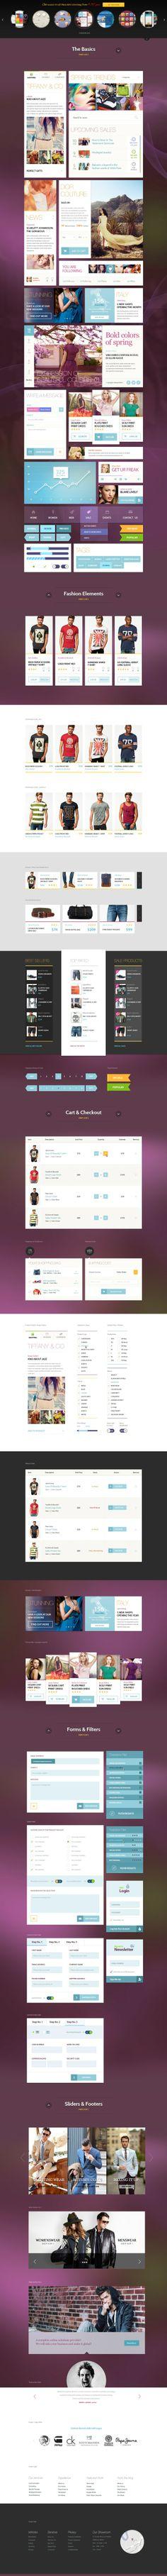 100 Fancy & Sexi Vector Elements for yout PROJECT! by WordPress Design Awards , via Behance Ui Kit, Website Design Layout, Layout Design, Joomla Themes, Wordpress Theme Design, Website Themes, Dashboards, Web Design Inspiration, Design Awards